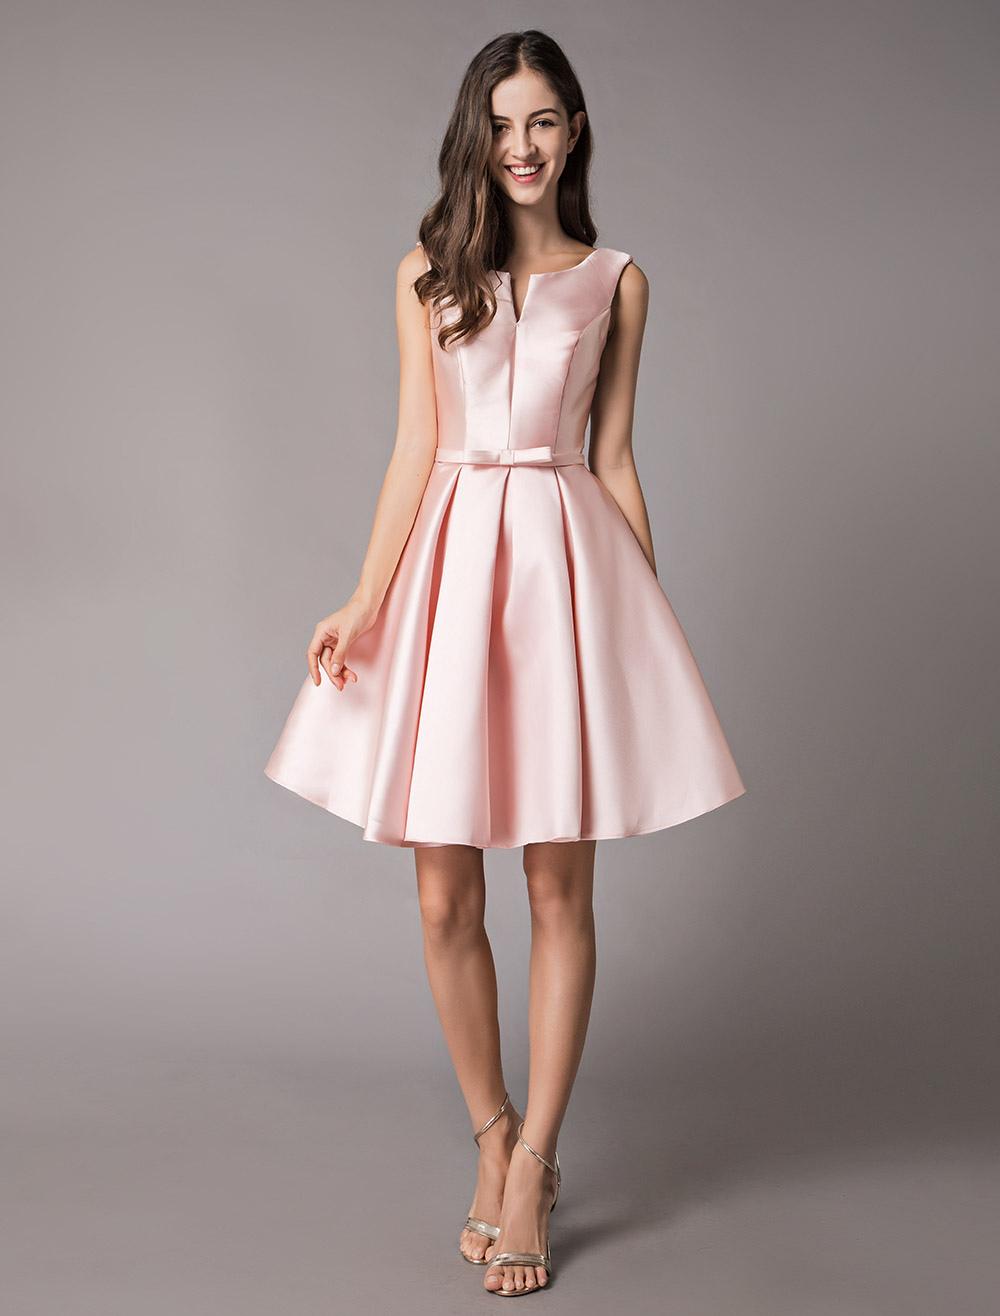 8c3f8ddf153b03 ... Satin Cocktail Dresses Soft Pink A Line Sleeveless Short Prom Dress-No.2  ...